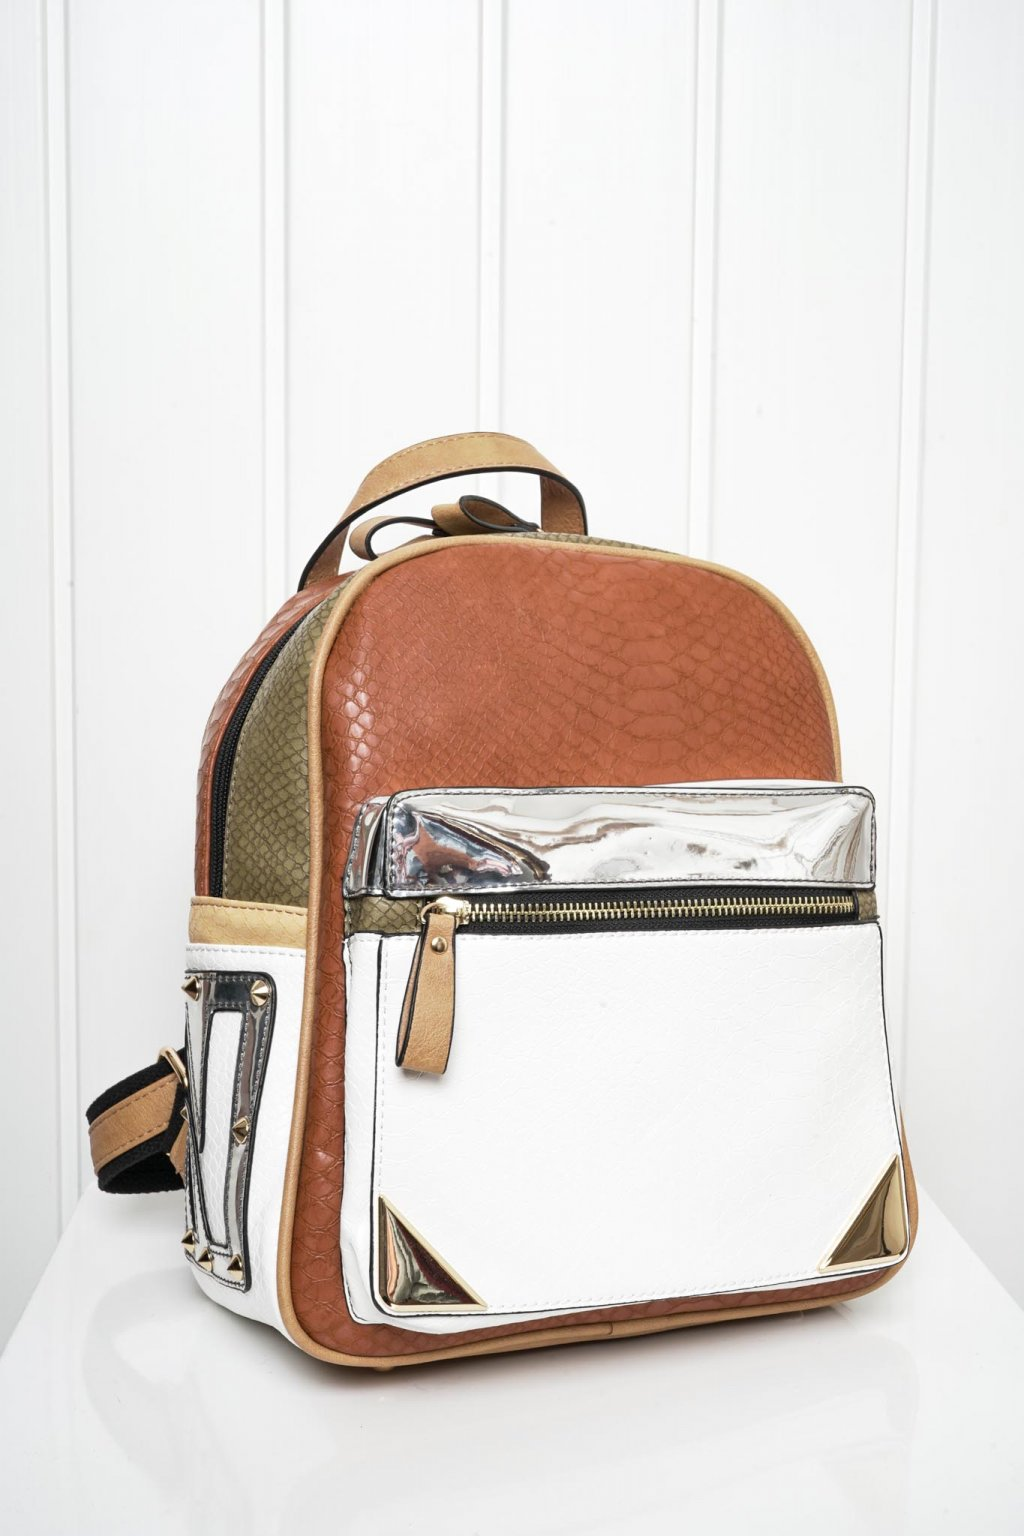 Kabelka, crossbody, ruksak, shopping bag, shopperka, 472